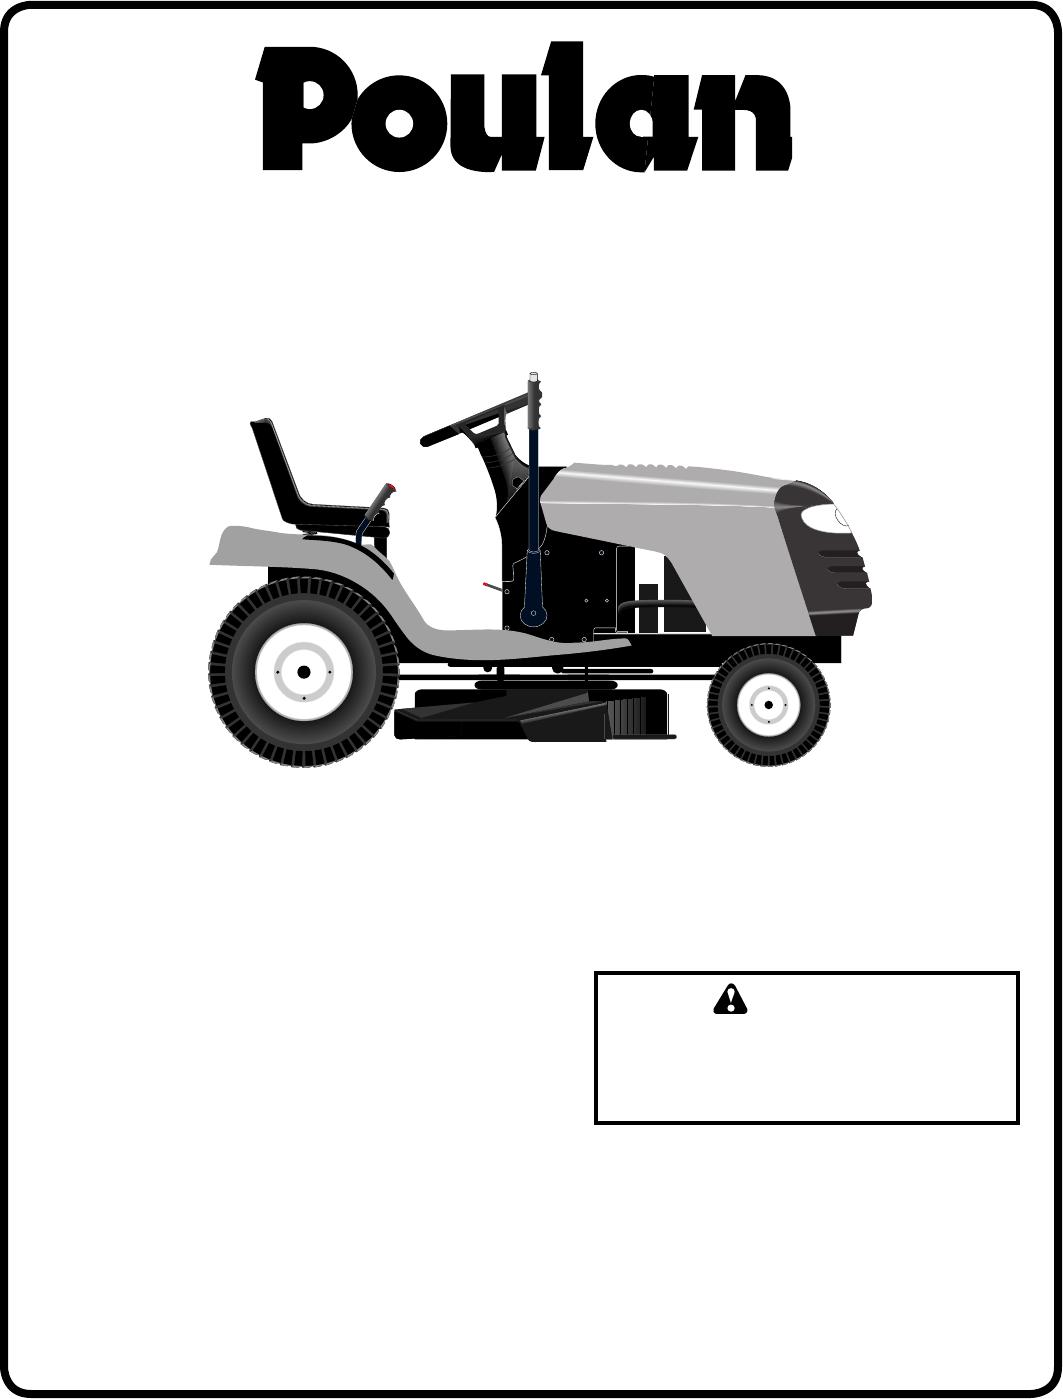 Poulan PB1842LT Lawn Mower User Manual